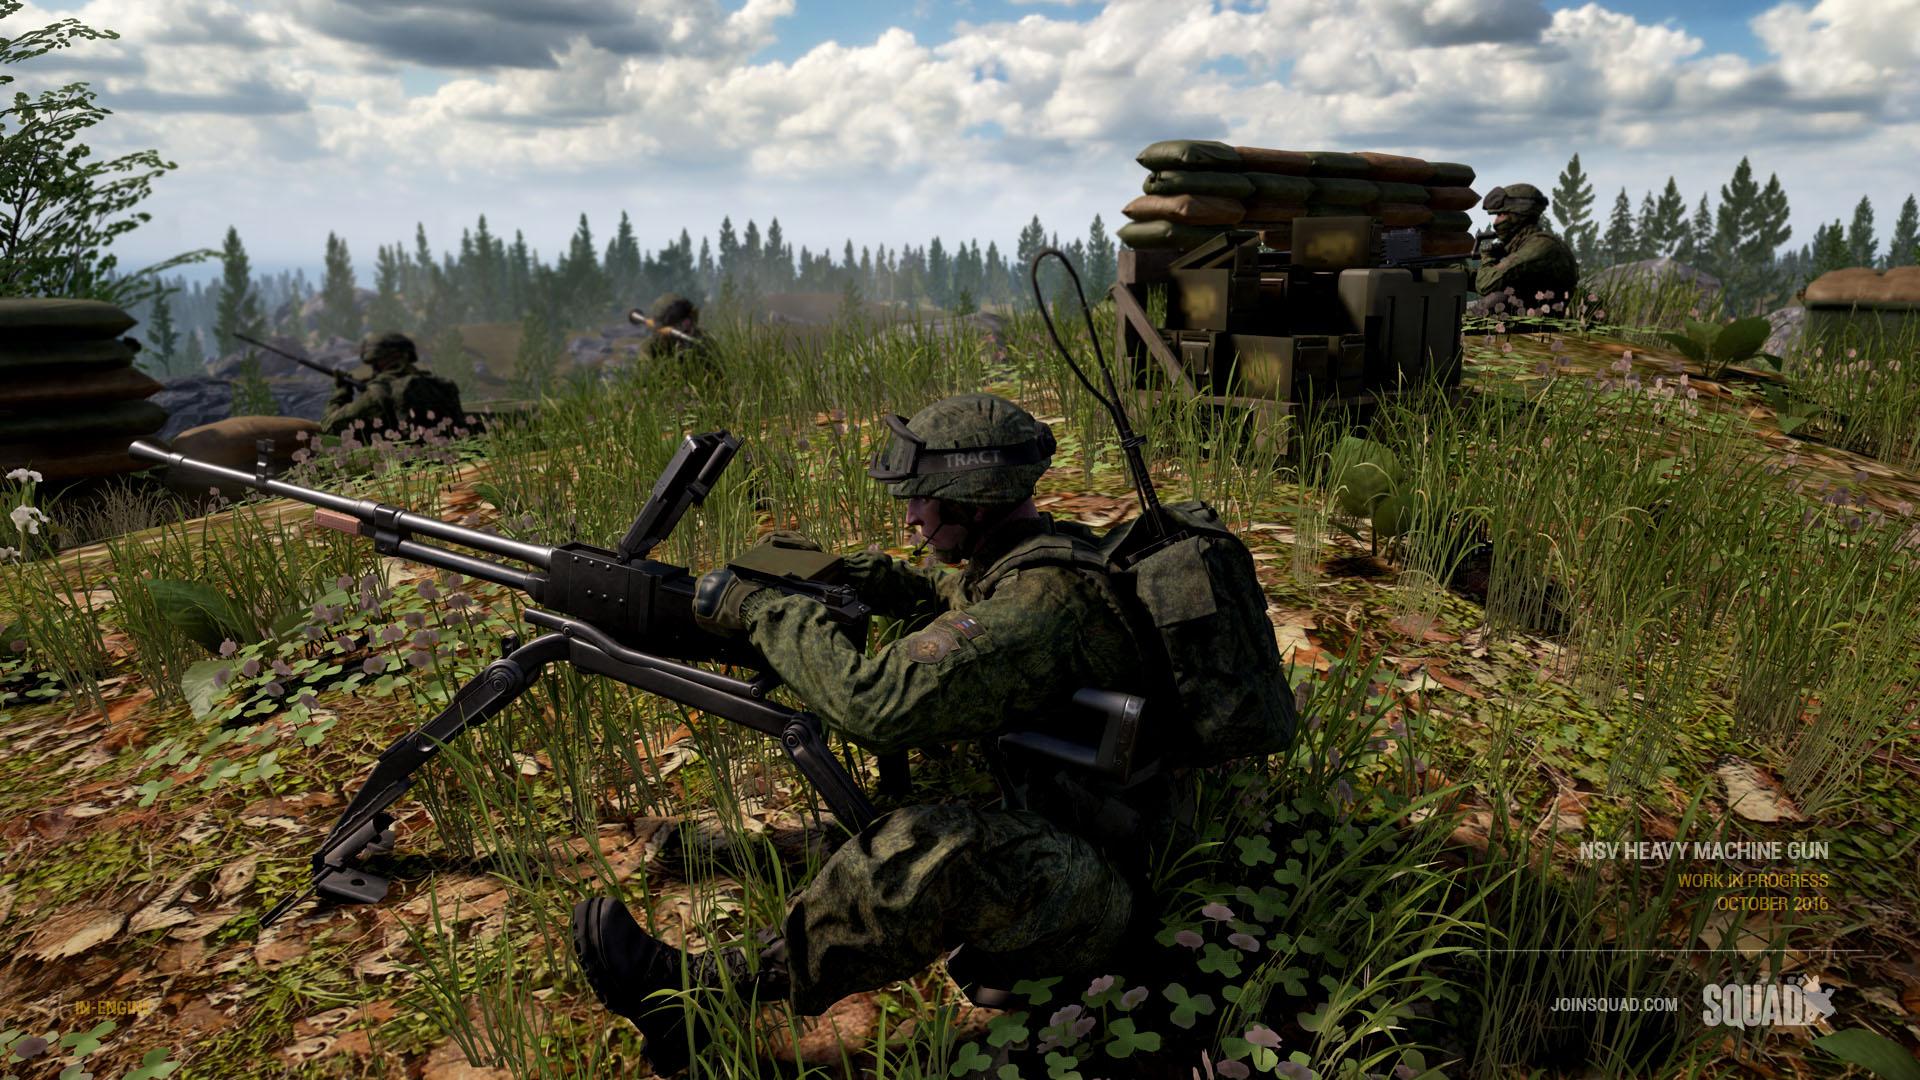 Combat Simulator | Toys not for kids